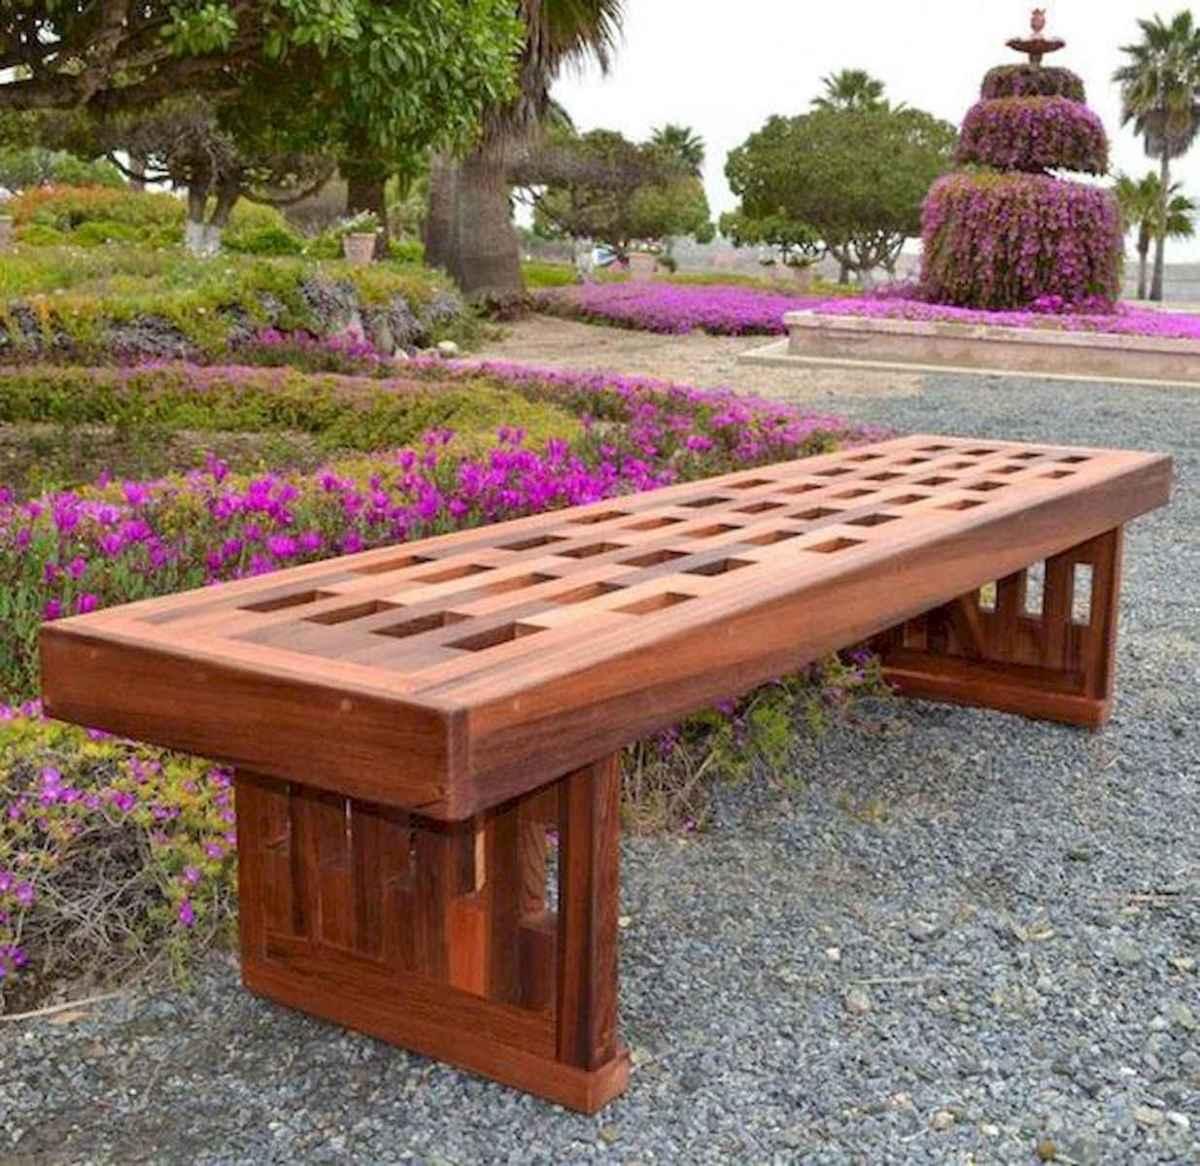 60 Amazing DIY Projects Otdoors Furniture Design Ideas (52)